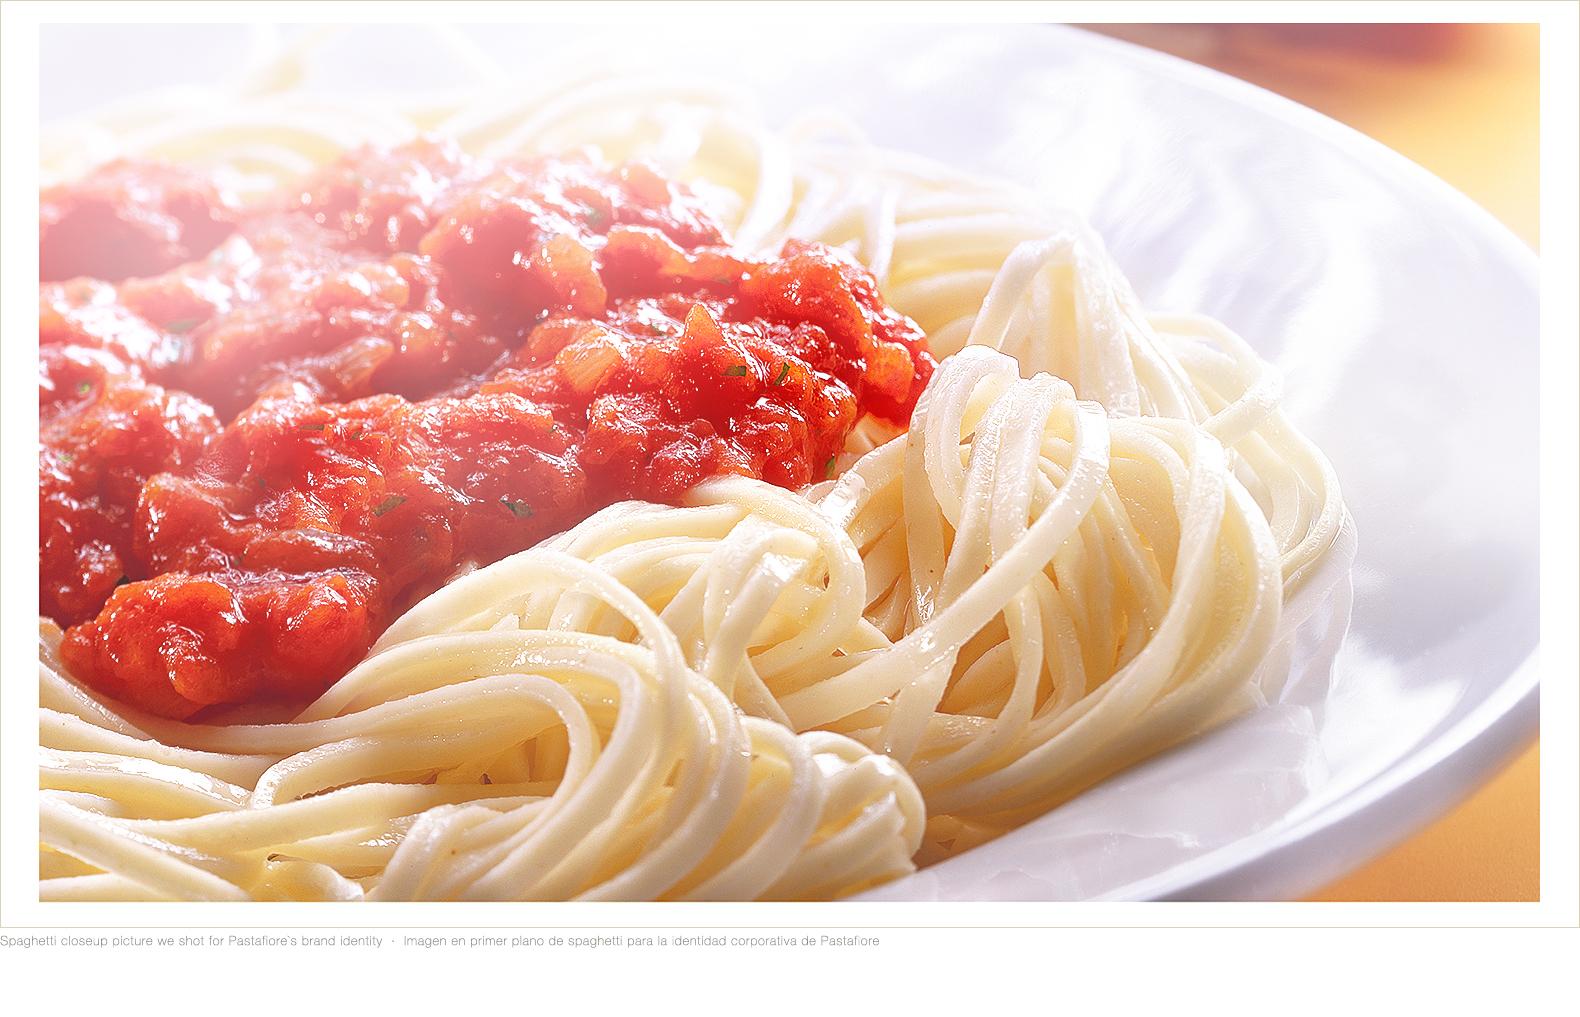 A09-Pastafiore-Spaguetti-FullSize-OK-OK.jpg